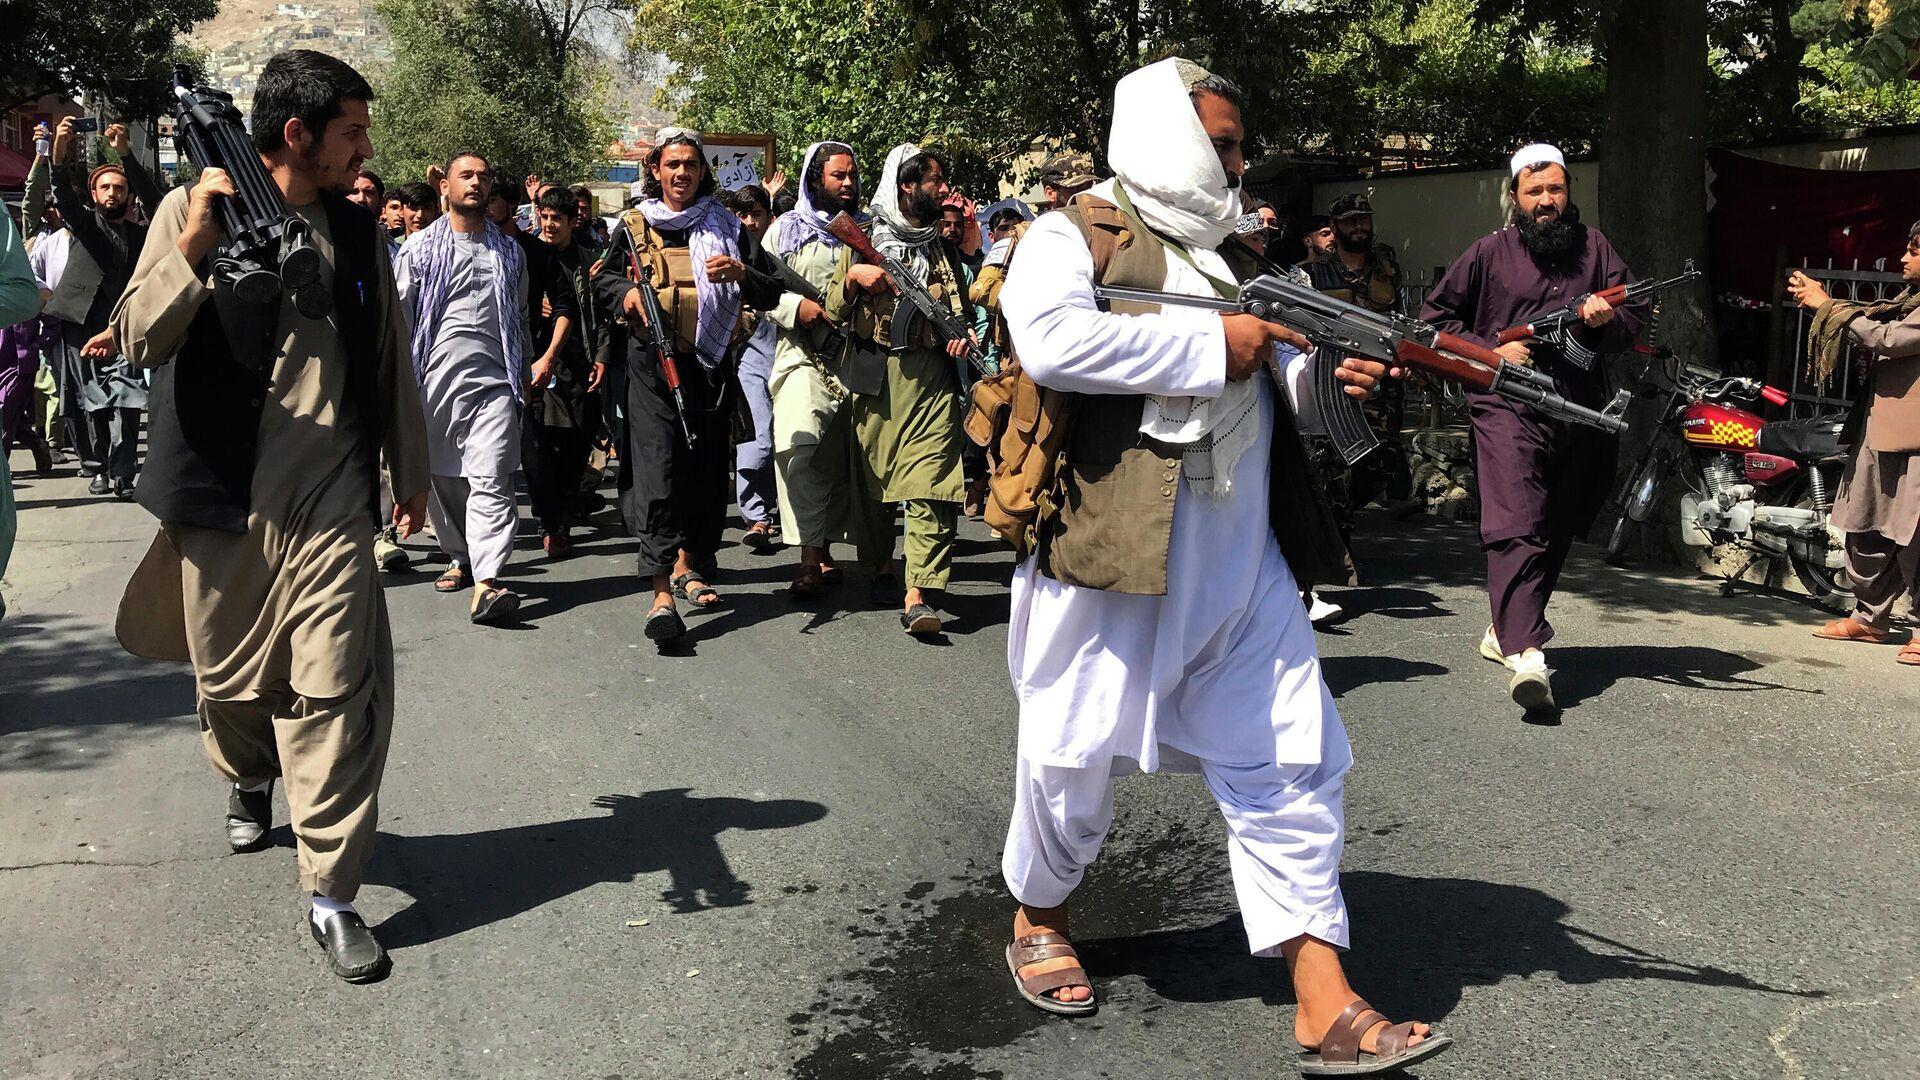 Боевики Талибана* на улице Кабула - РИА Новости, 1920, 13.09.2021